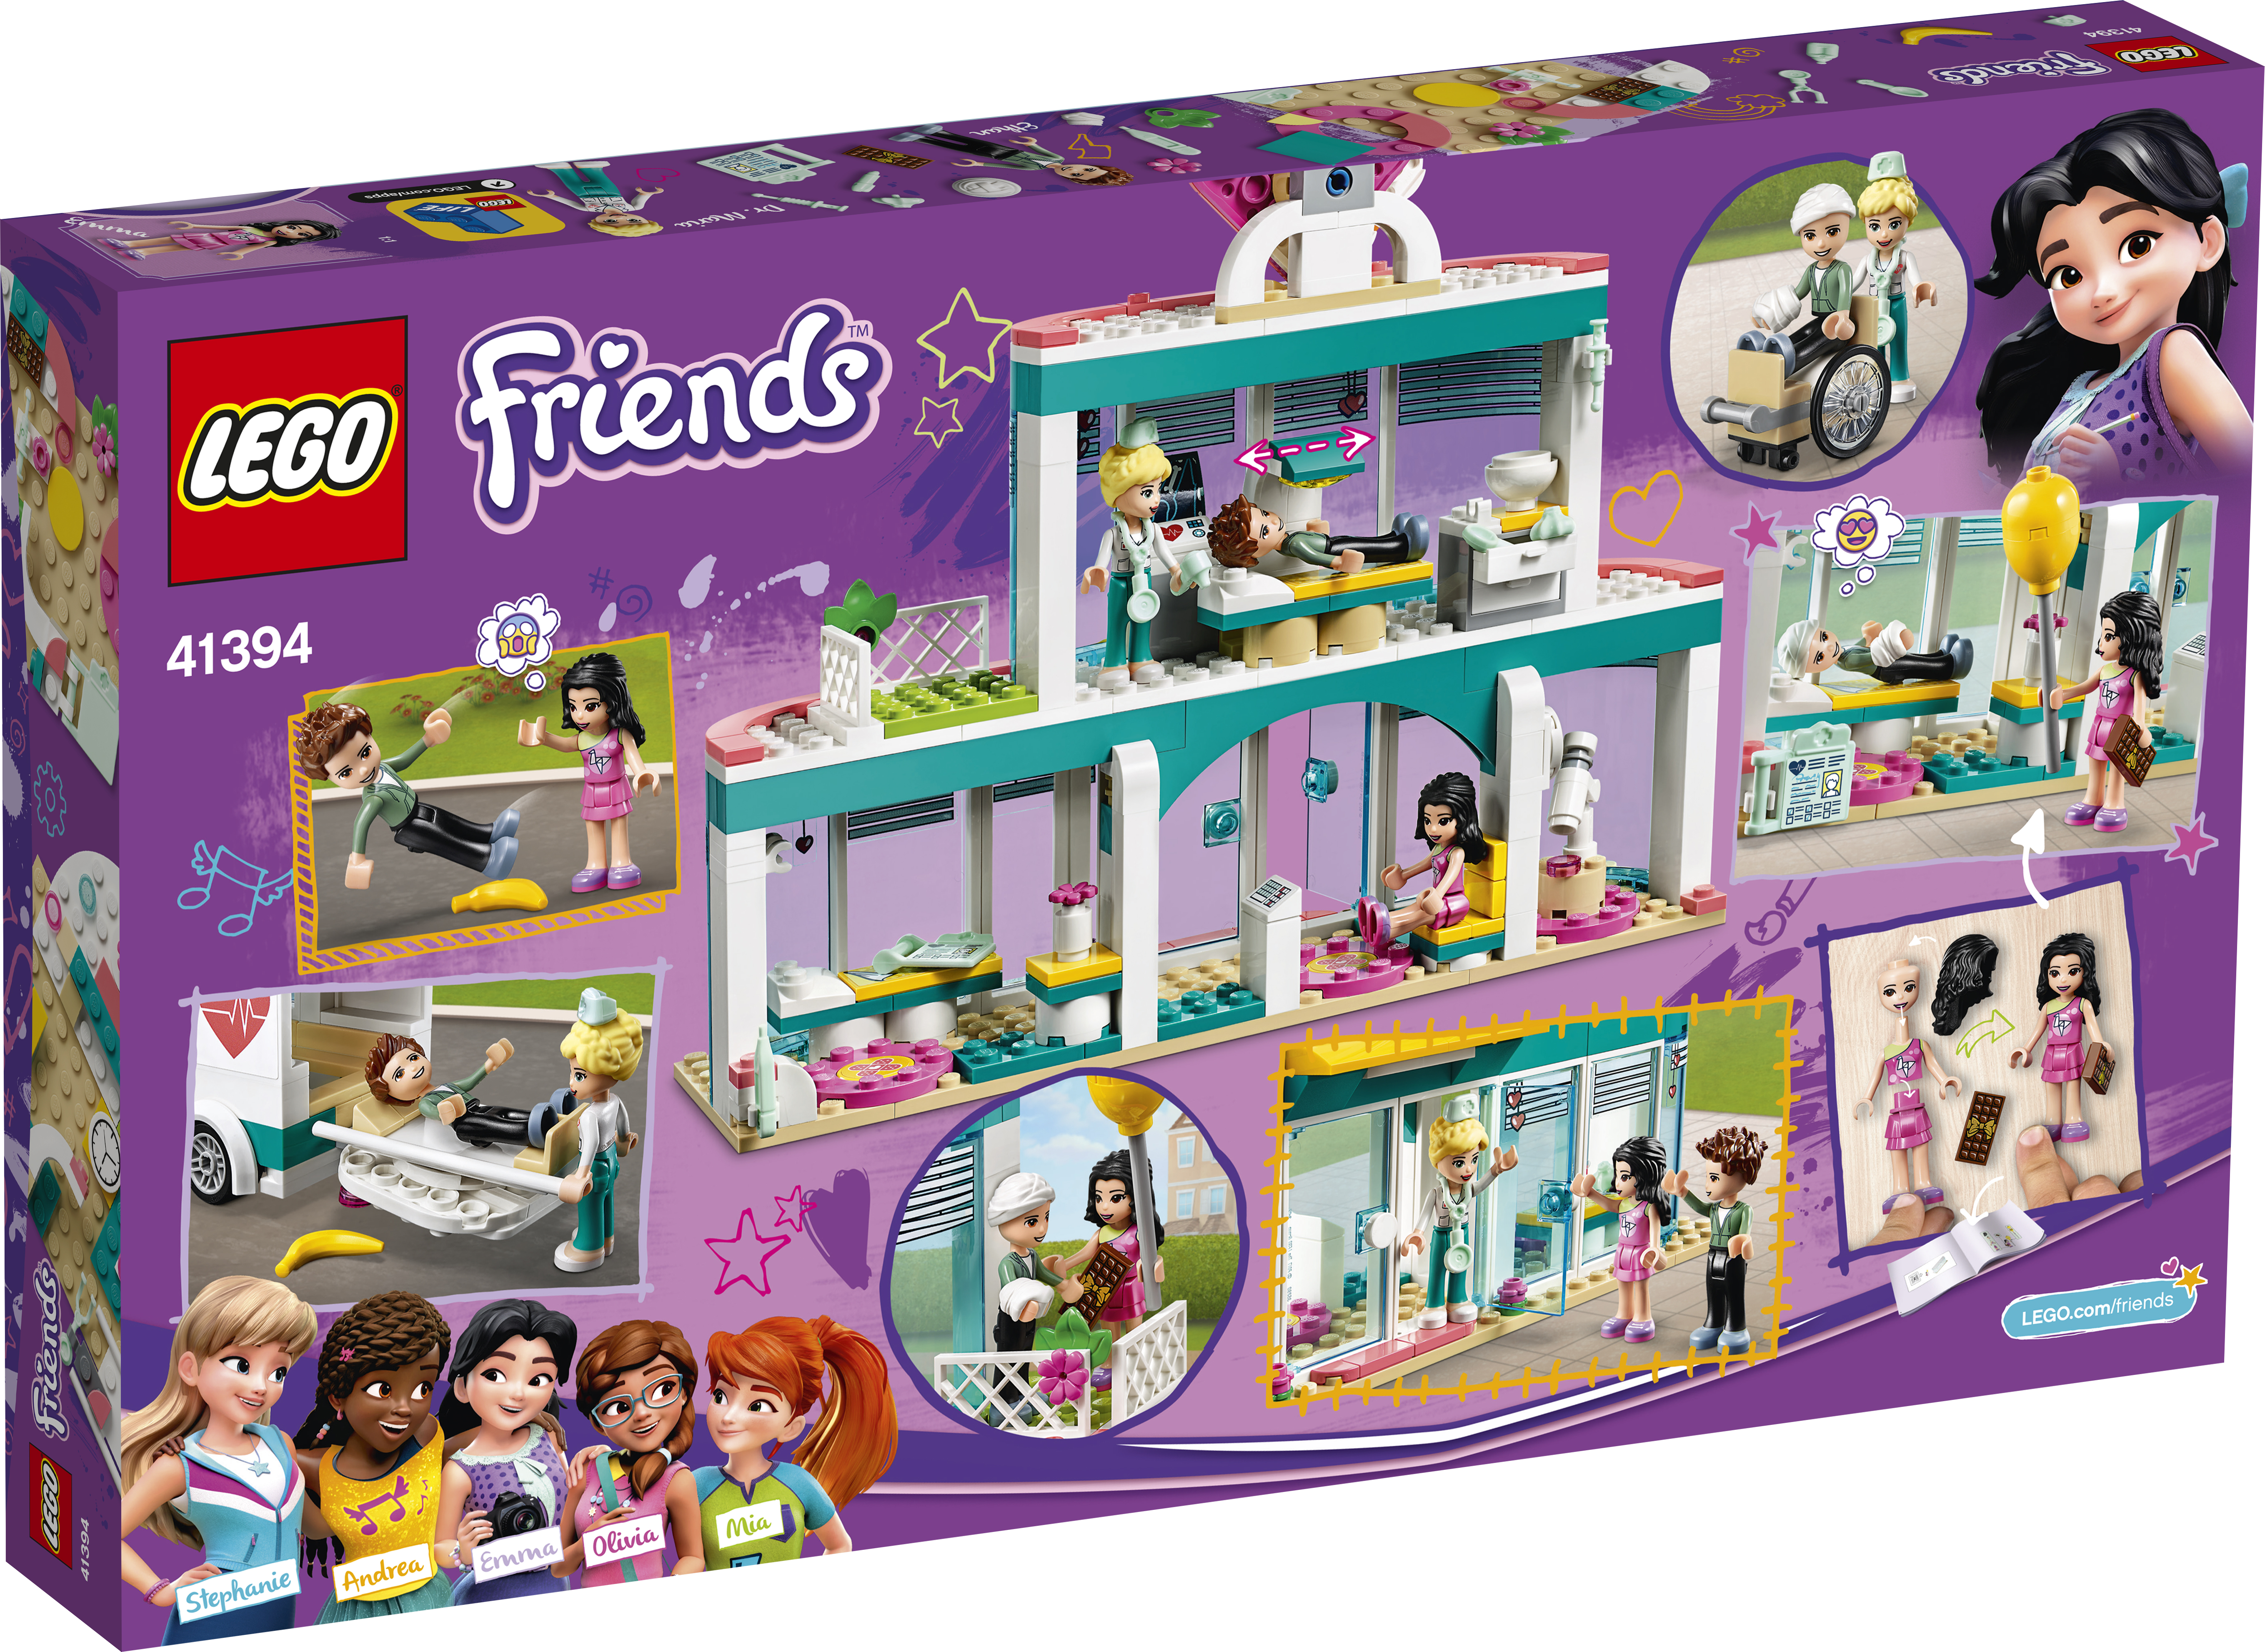 LEGO Friends Heartlake hospital - 41394